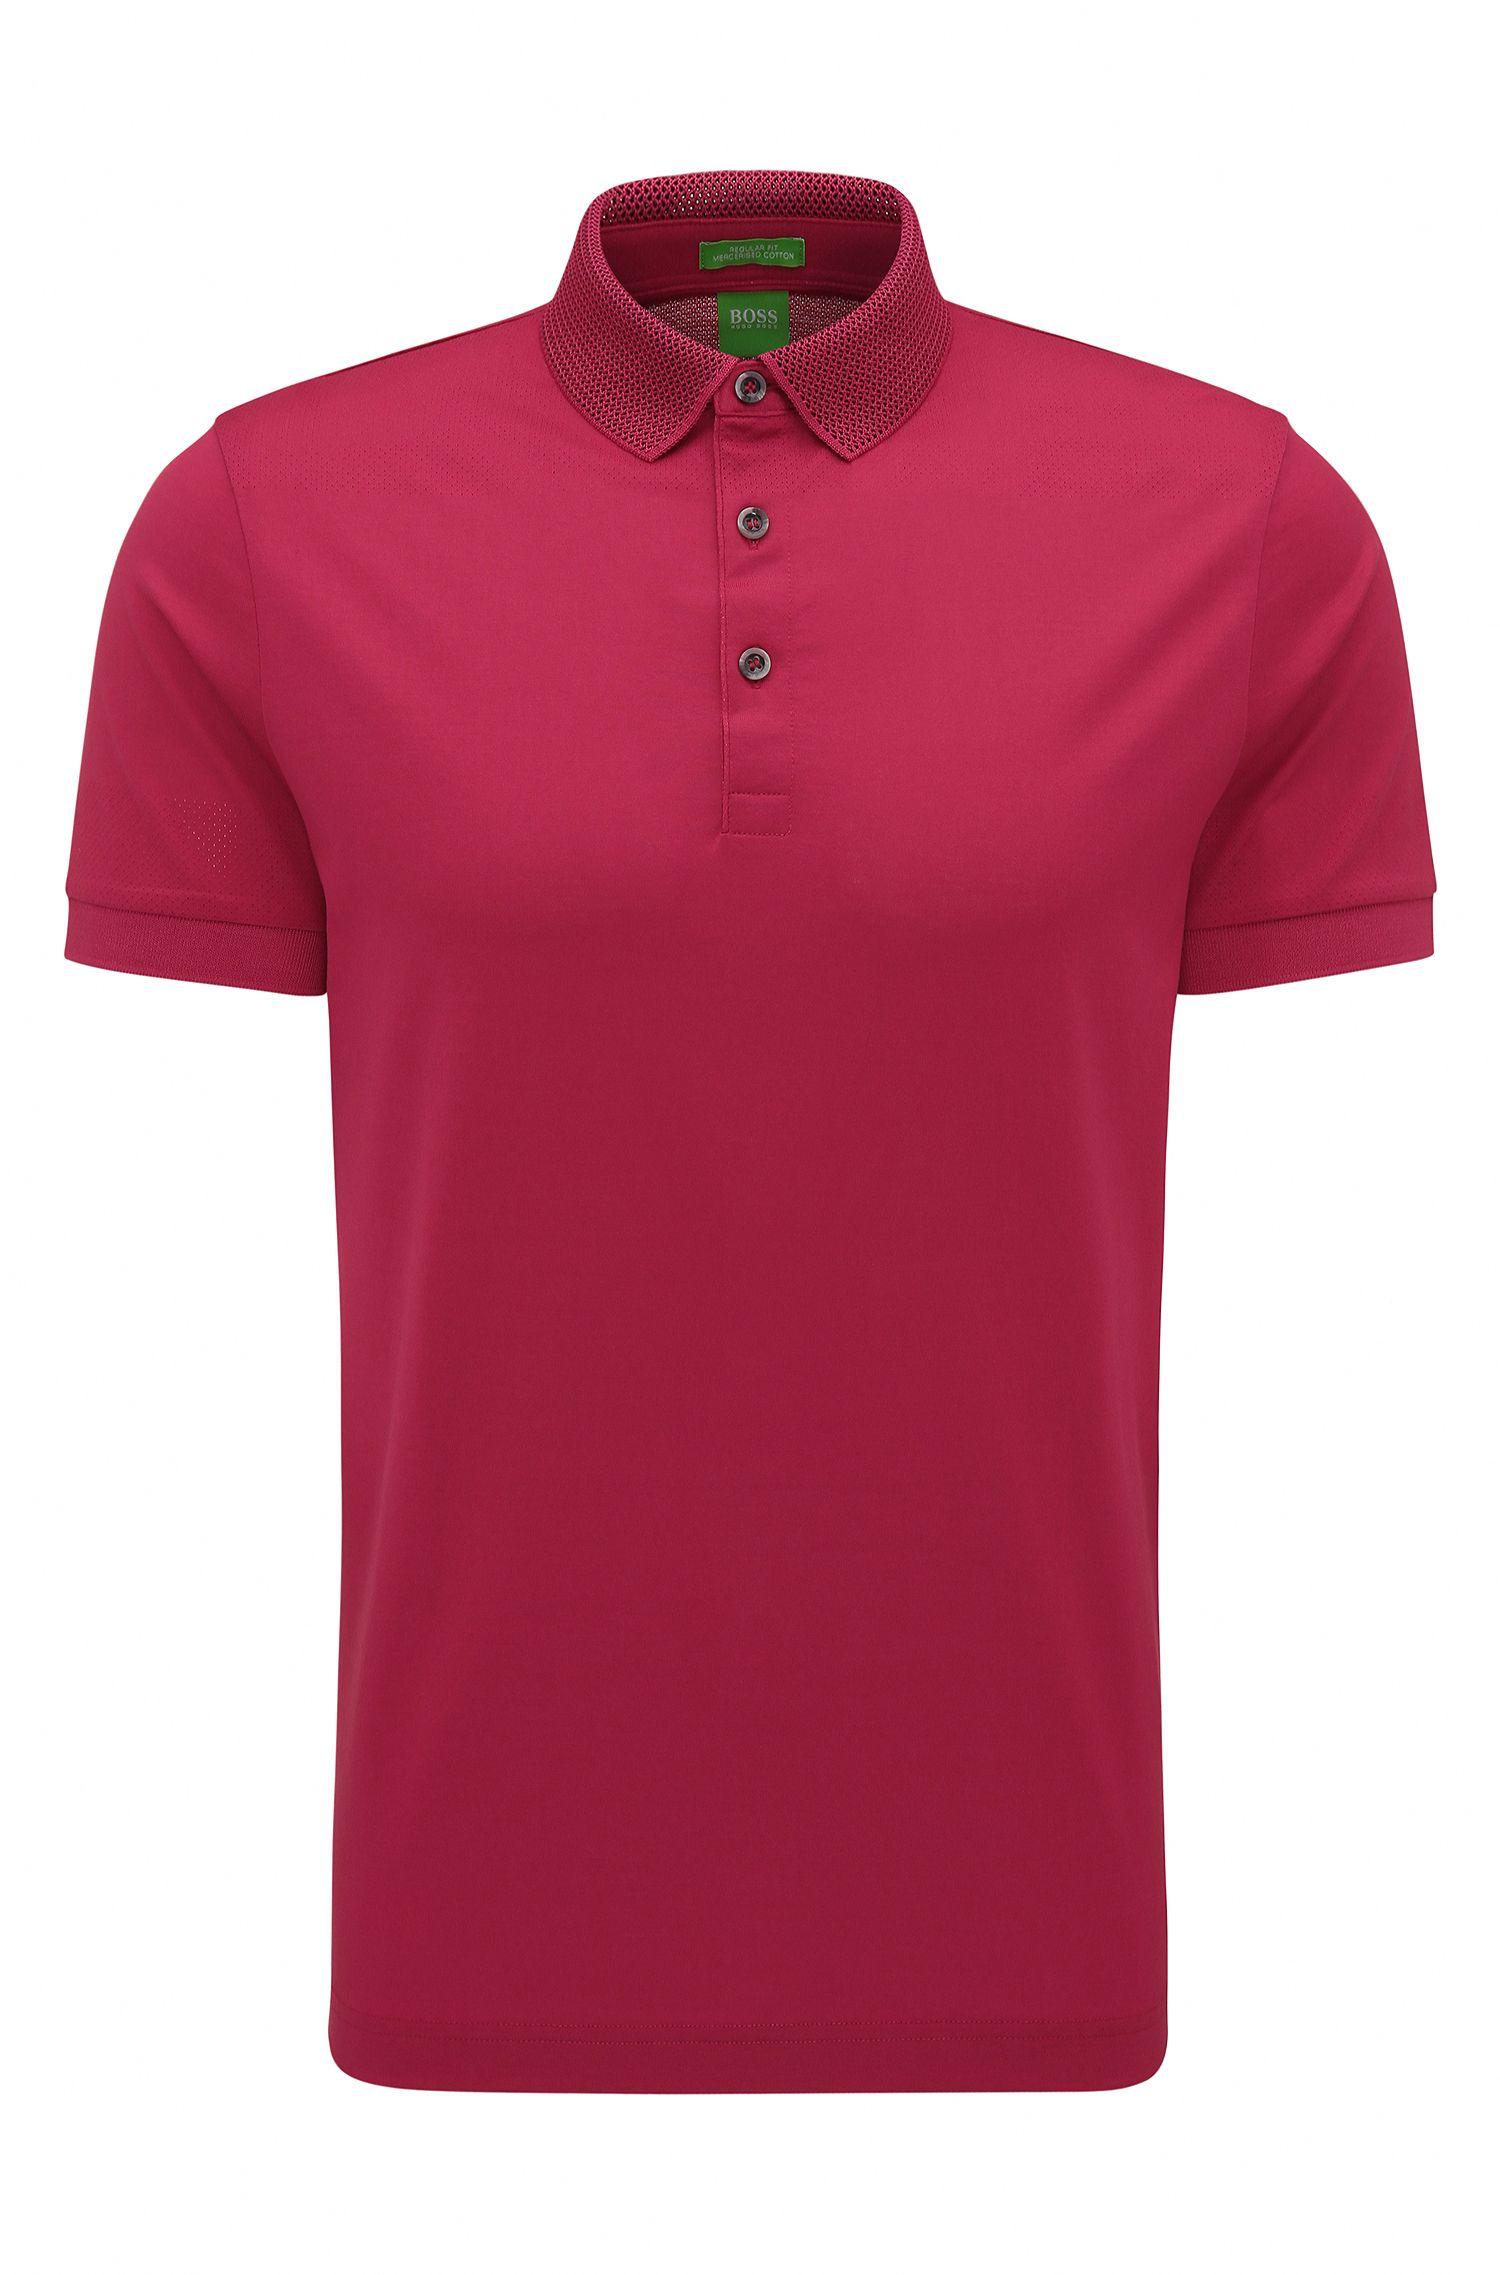 'C-Pirenzo' | Mercerized Cotton Polo Shirt